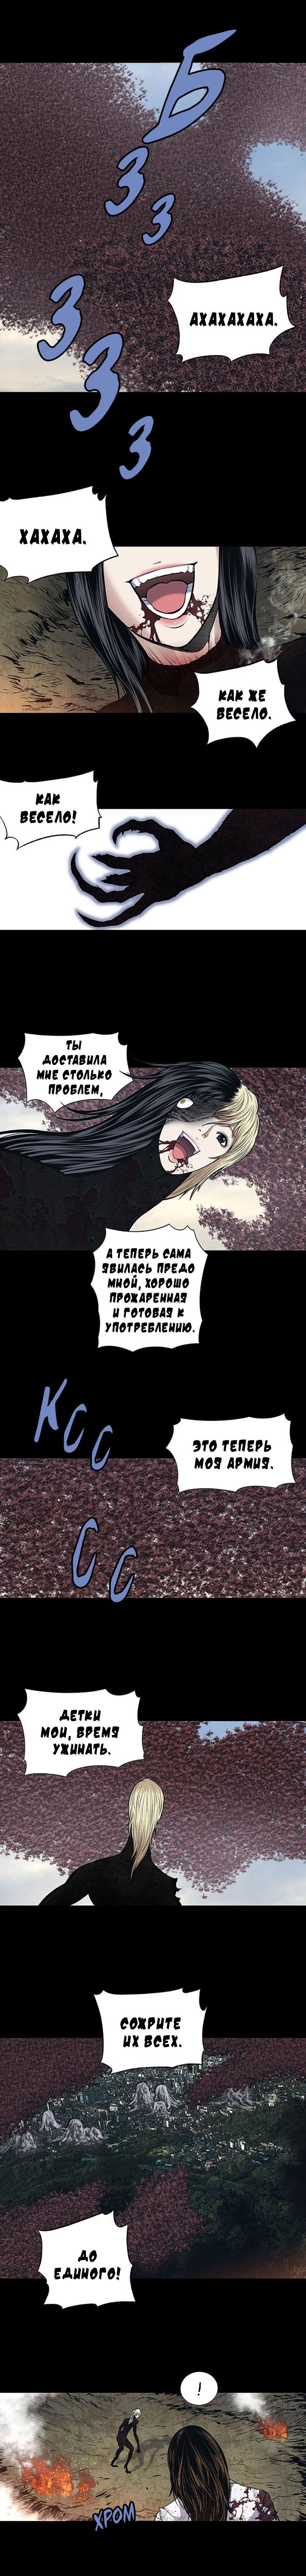 https://r2.ninemanga.com/comics/pic3/48/21936/1291572/1545485537690.jpg Page 1